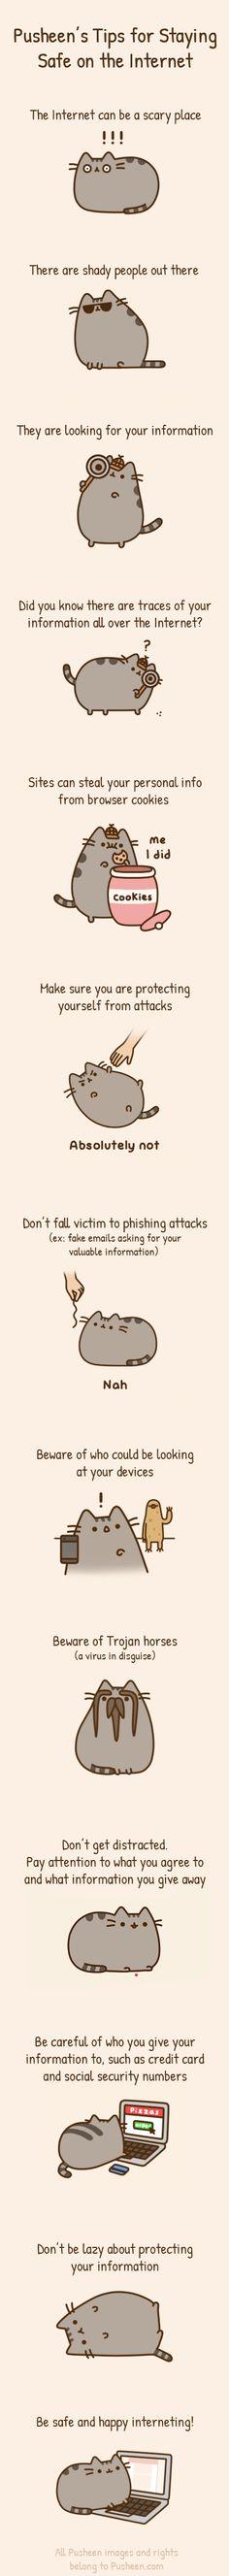 Pusheen internet tips